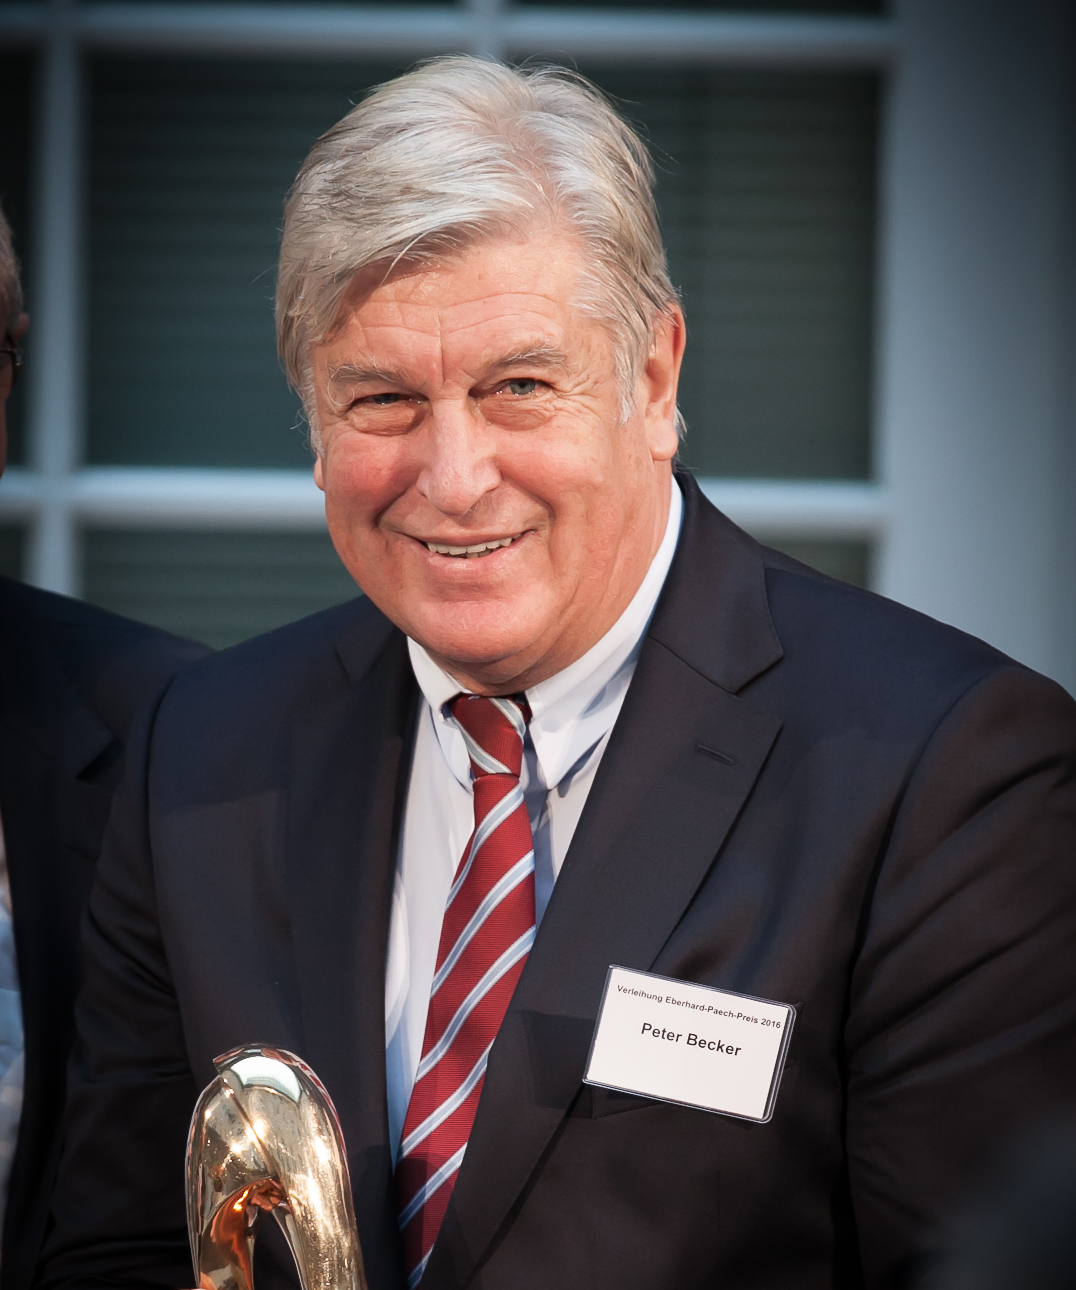 Eberhard-Paech-Preis